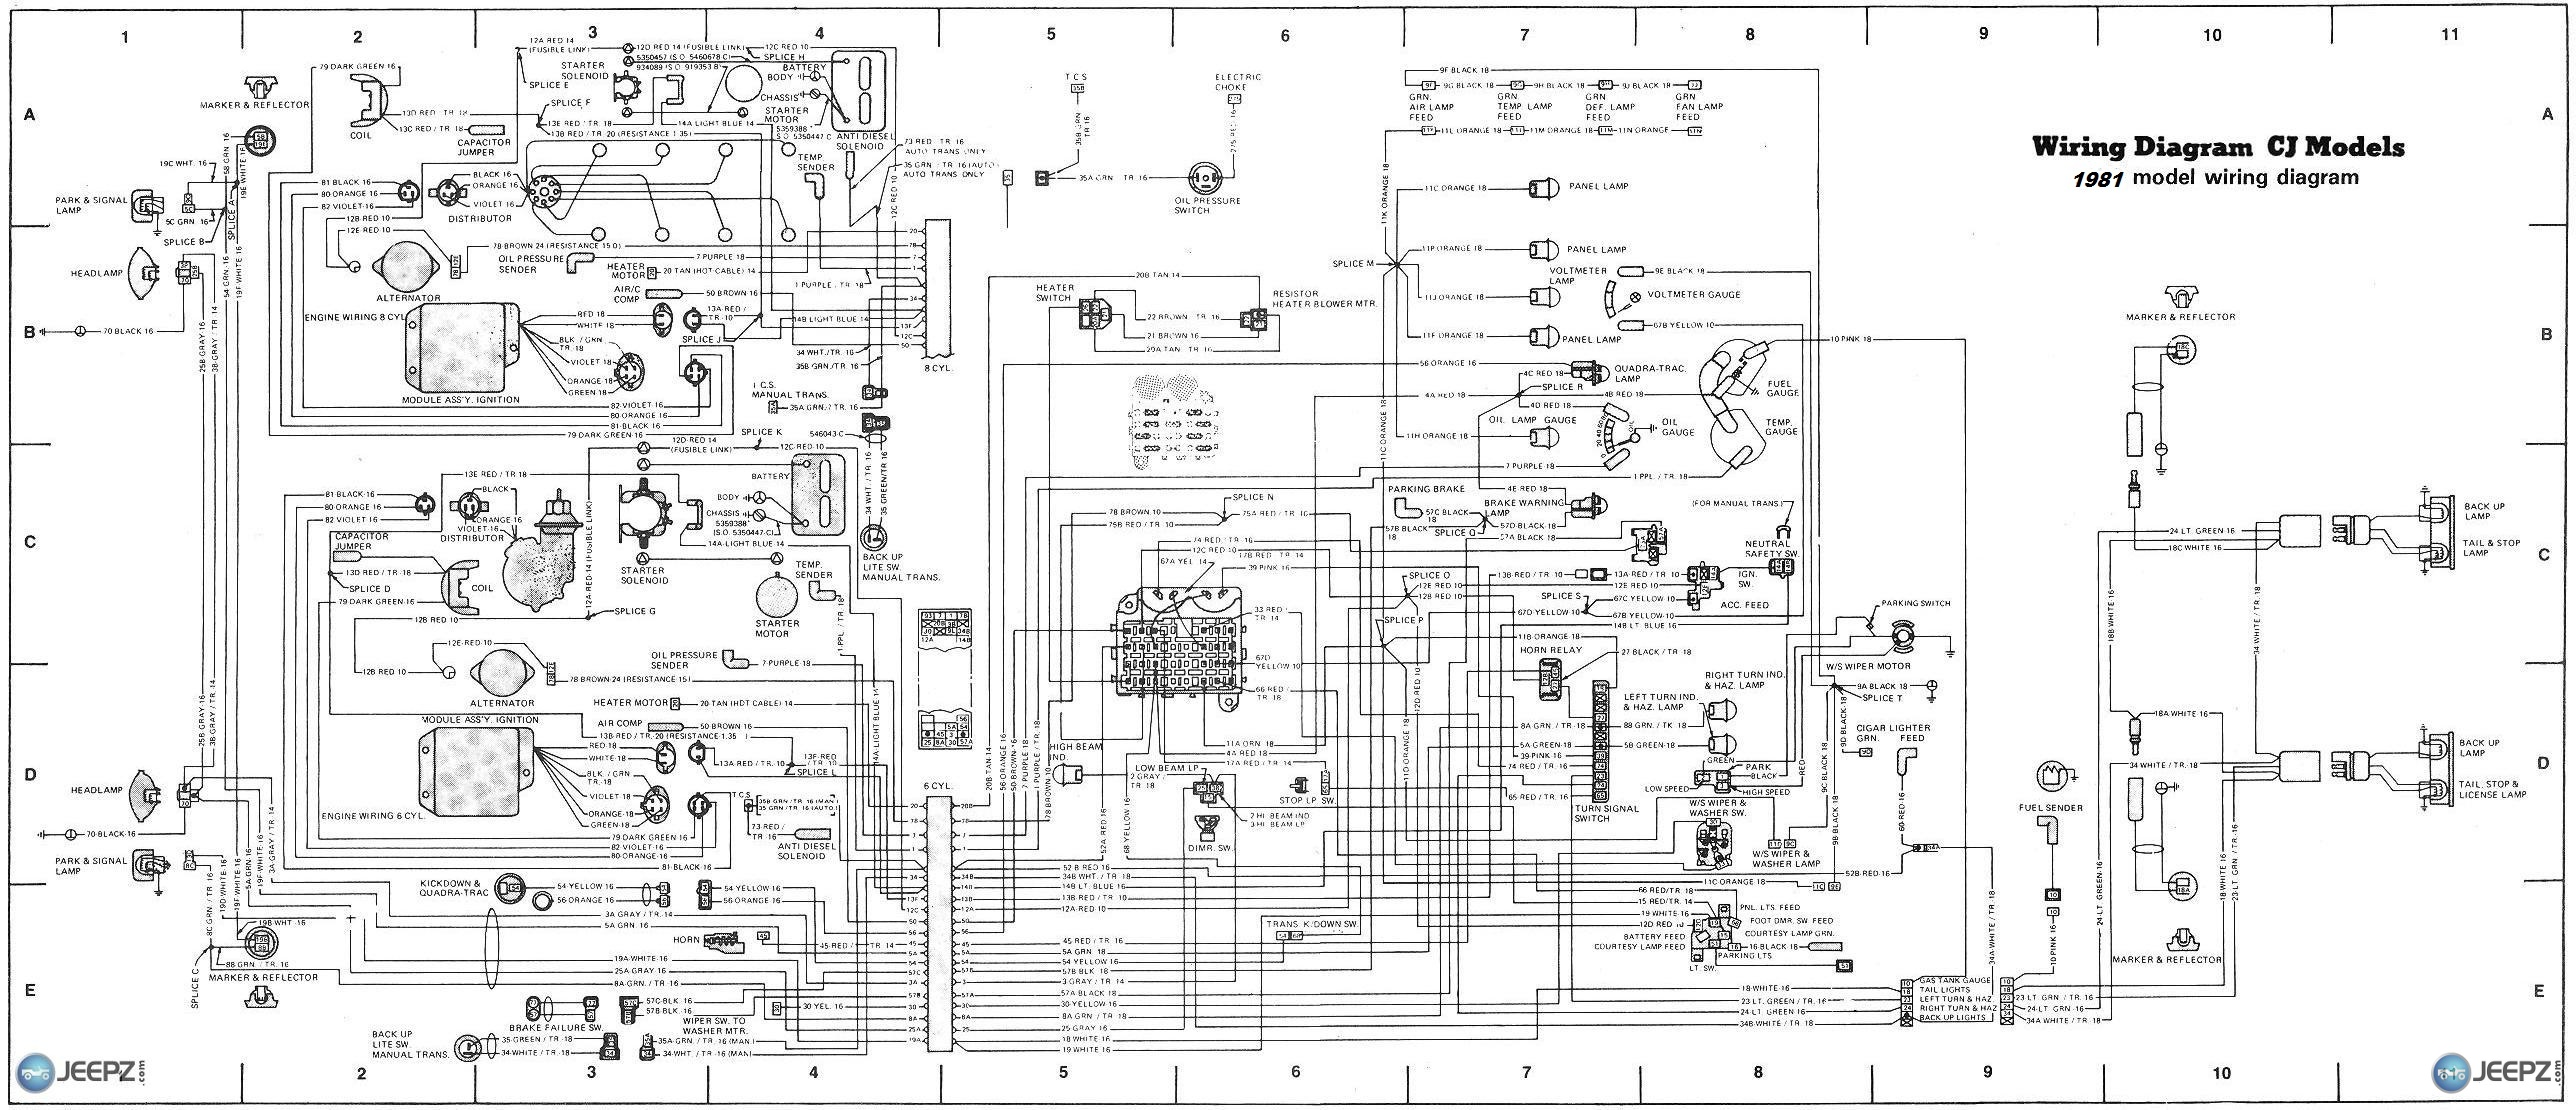 Cj Wiring Harness Tail Data Diagram Schema Caterpillar 1983 1985 Jeep Cj7 Amp Bypass Engine